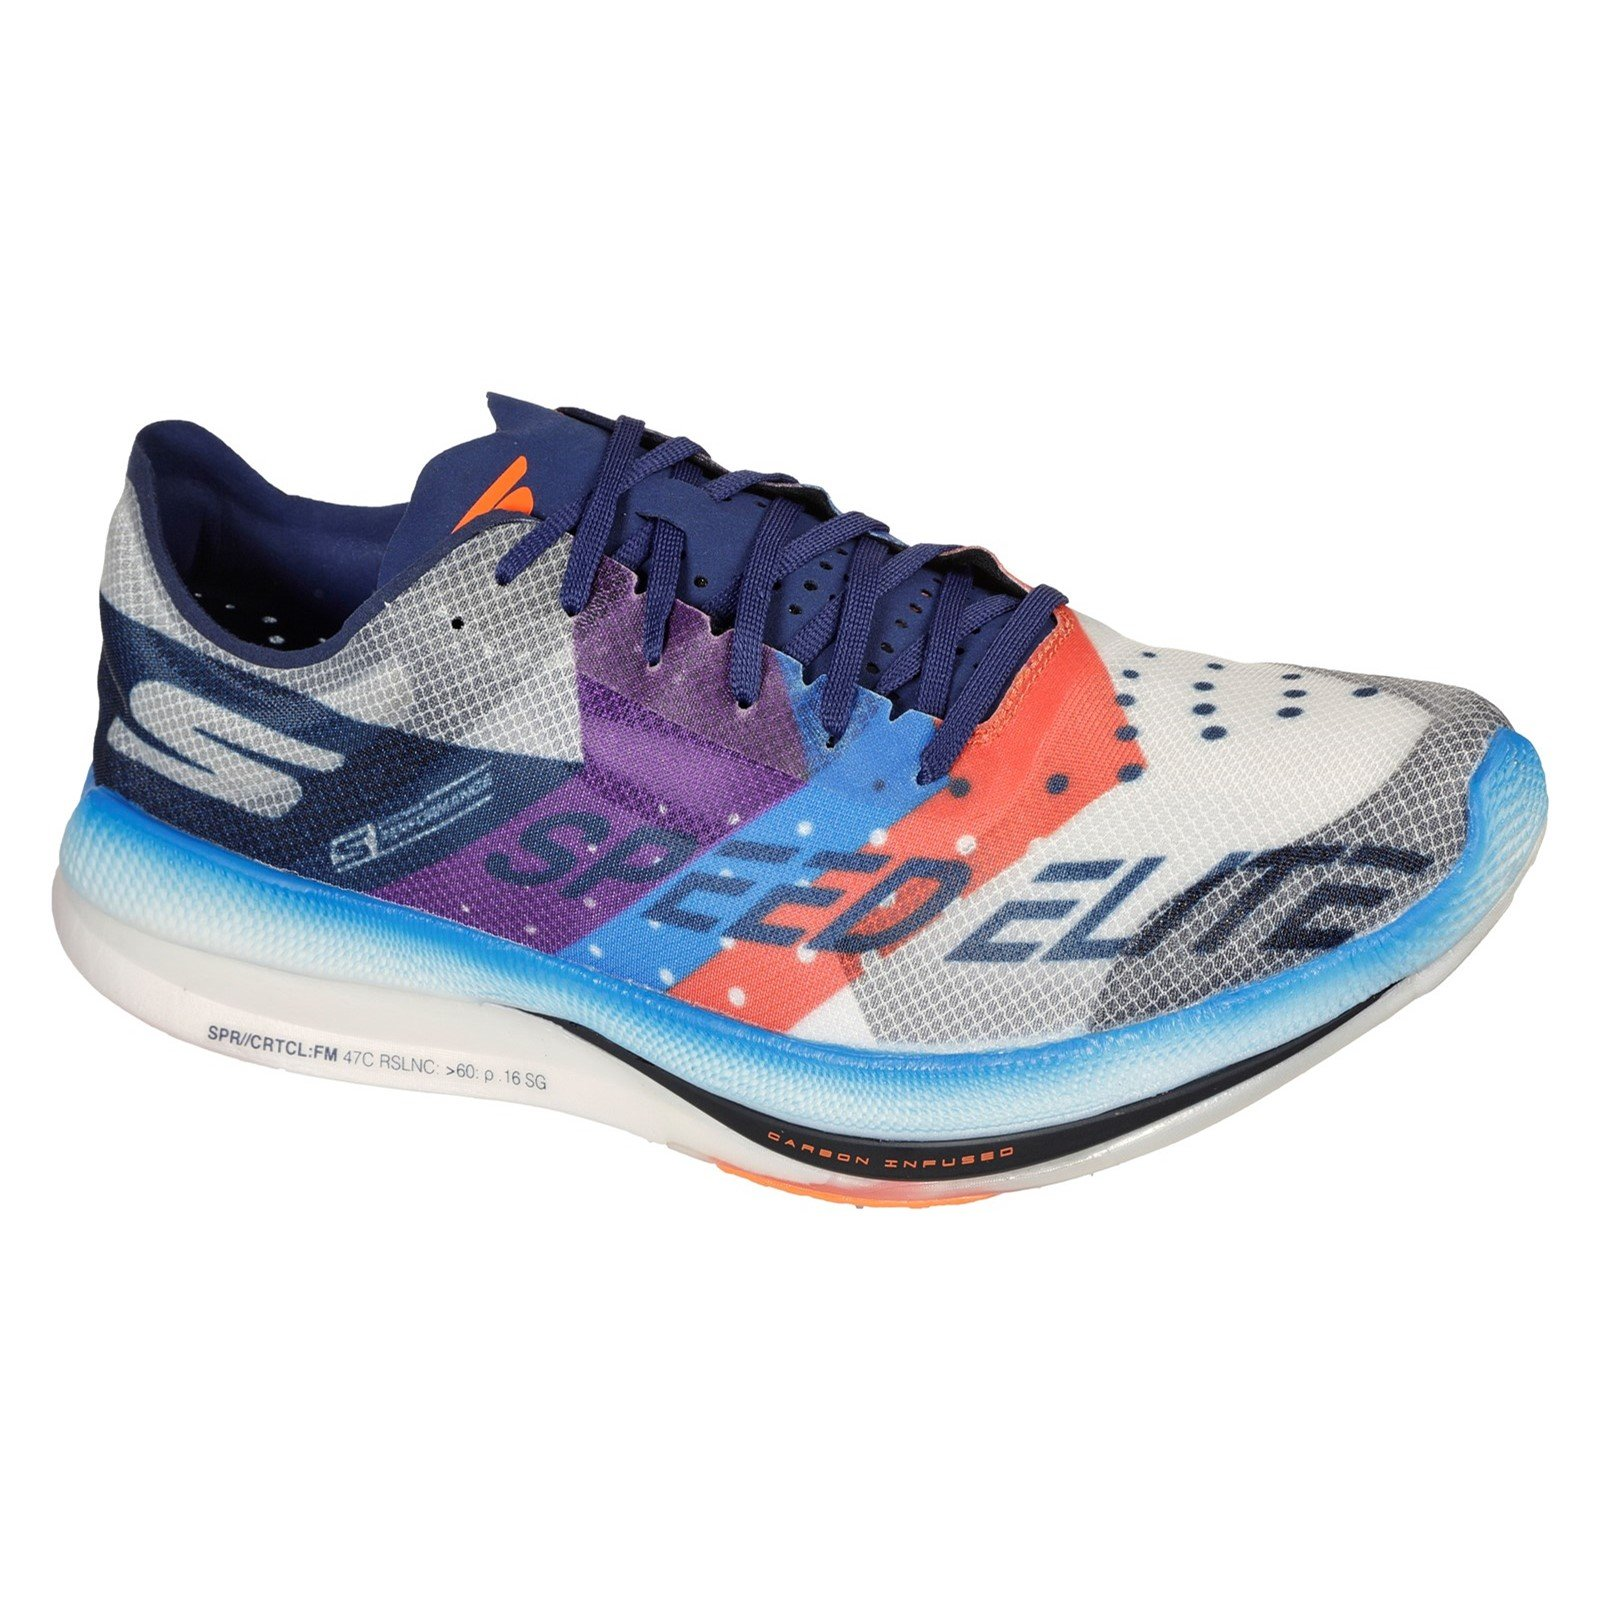 Skechers Men's Go Run Speed Elite Trainer Multicolor 32700 - White/Multi 10